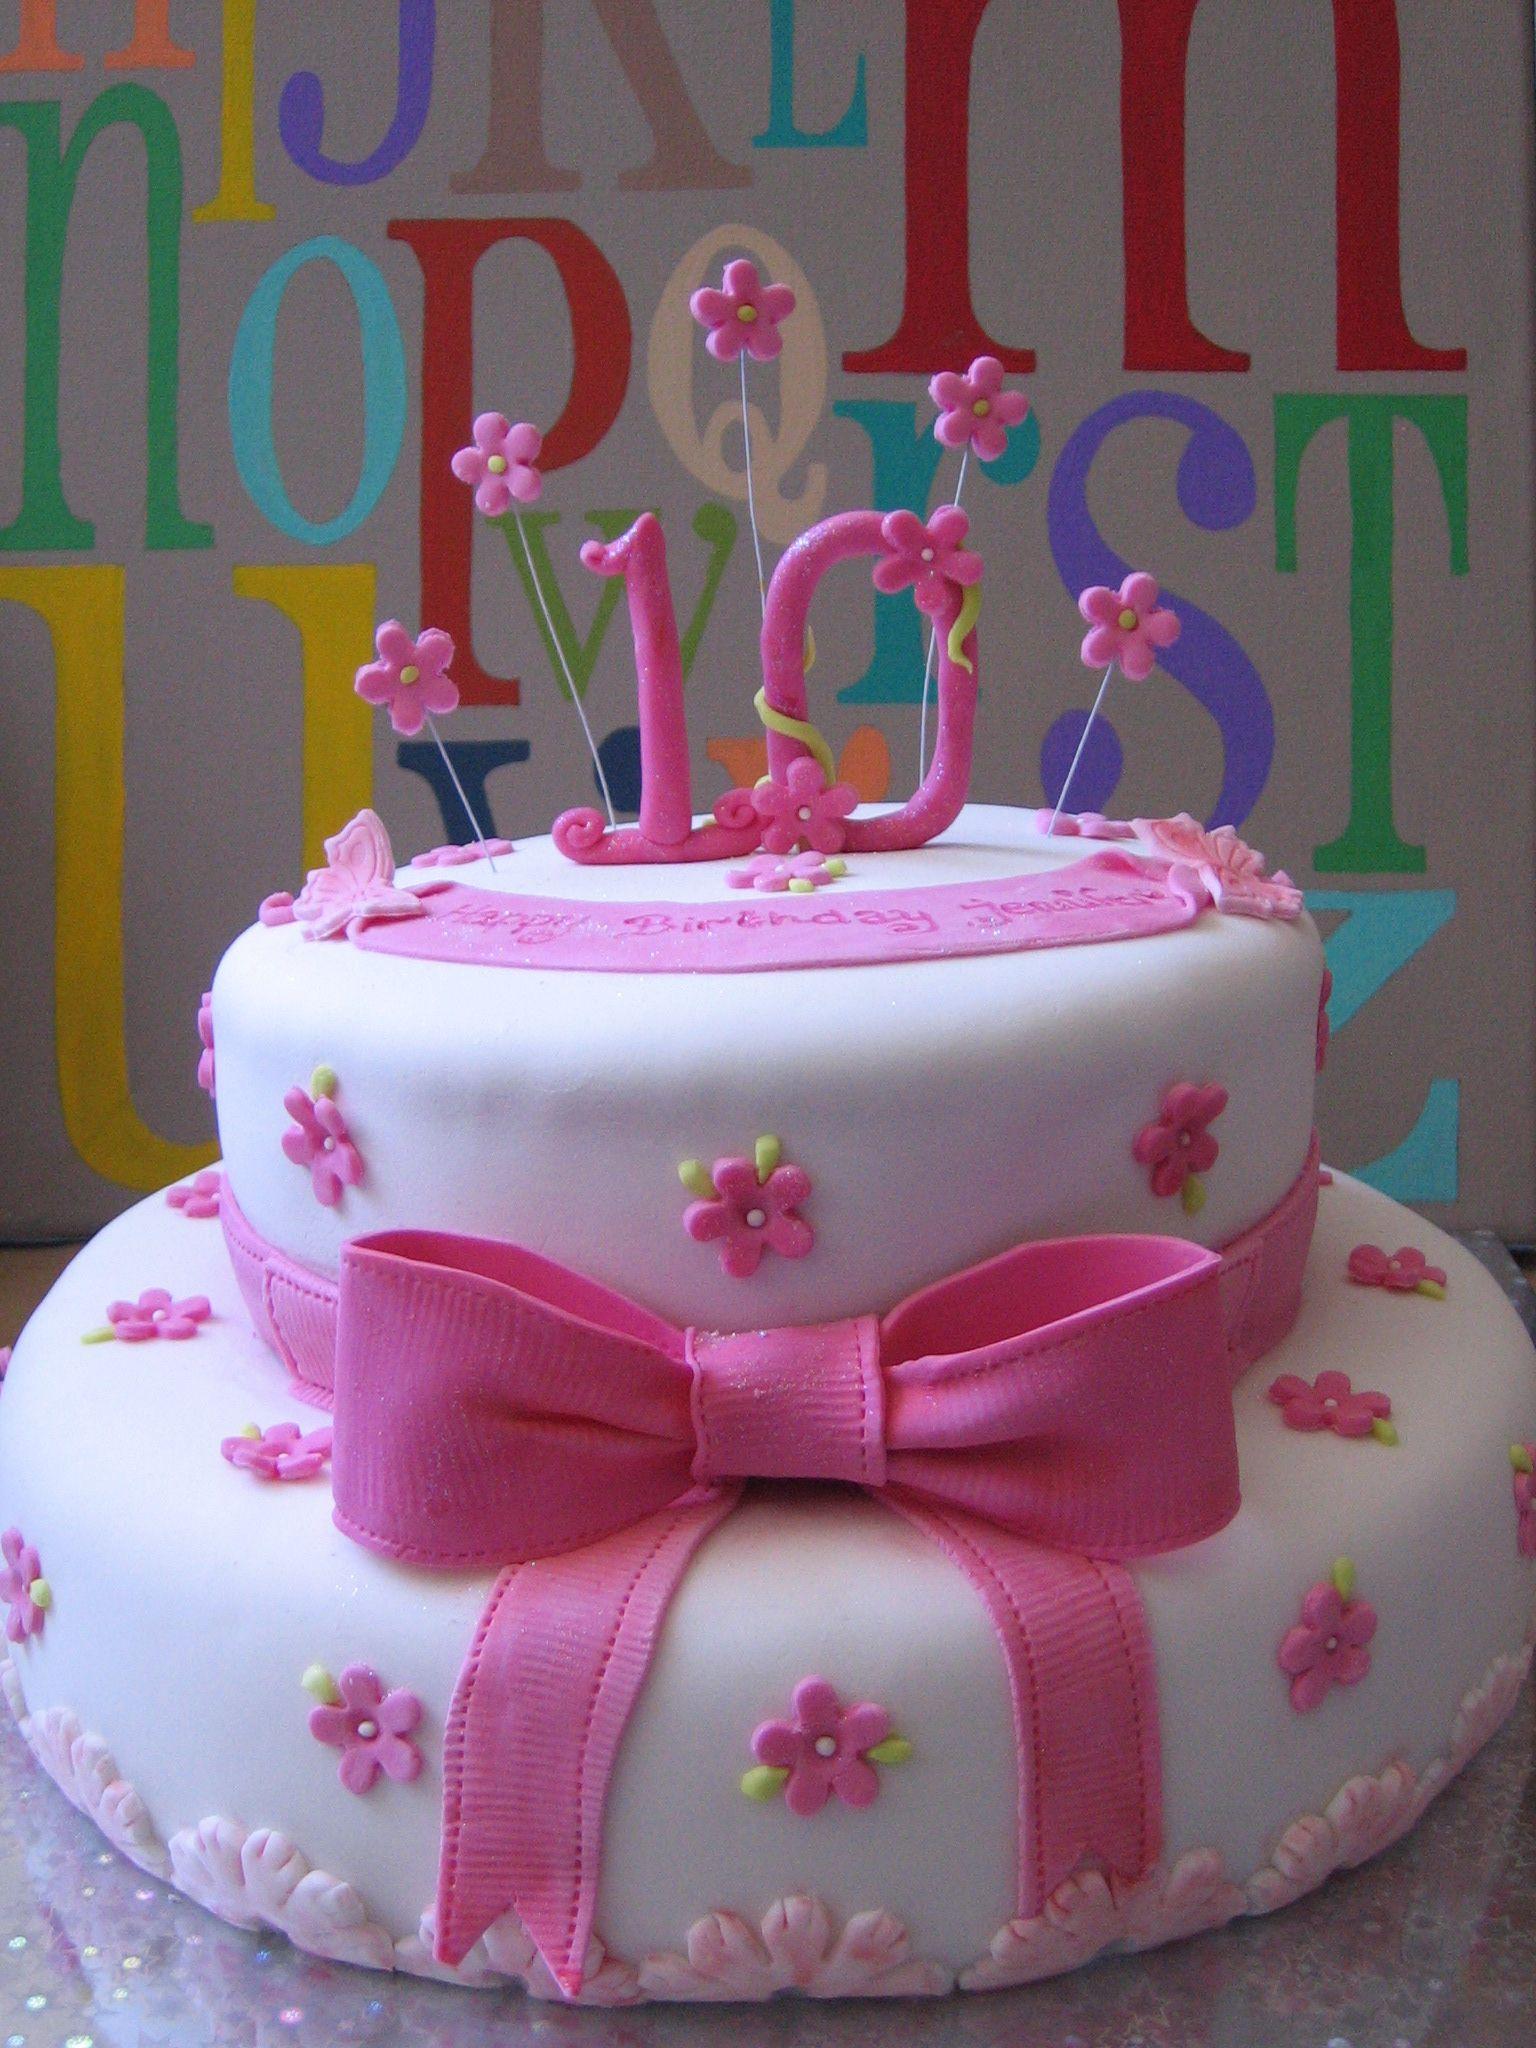 10 Year Old S Birthday Cake